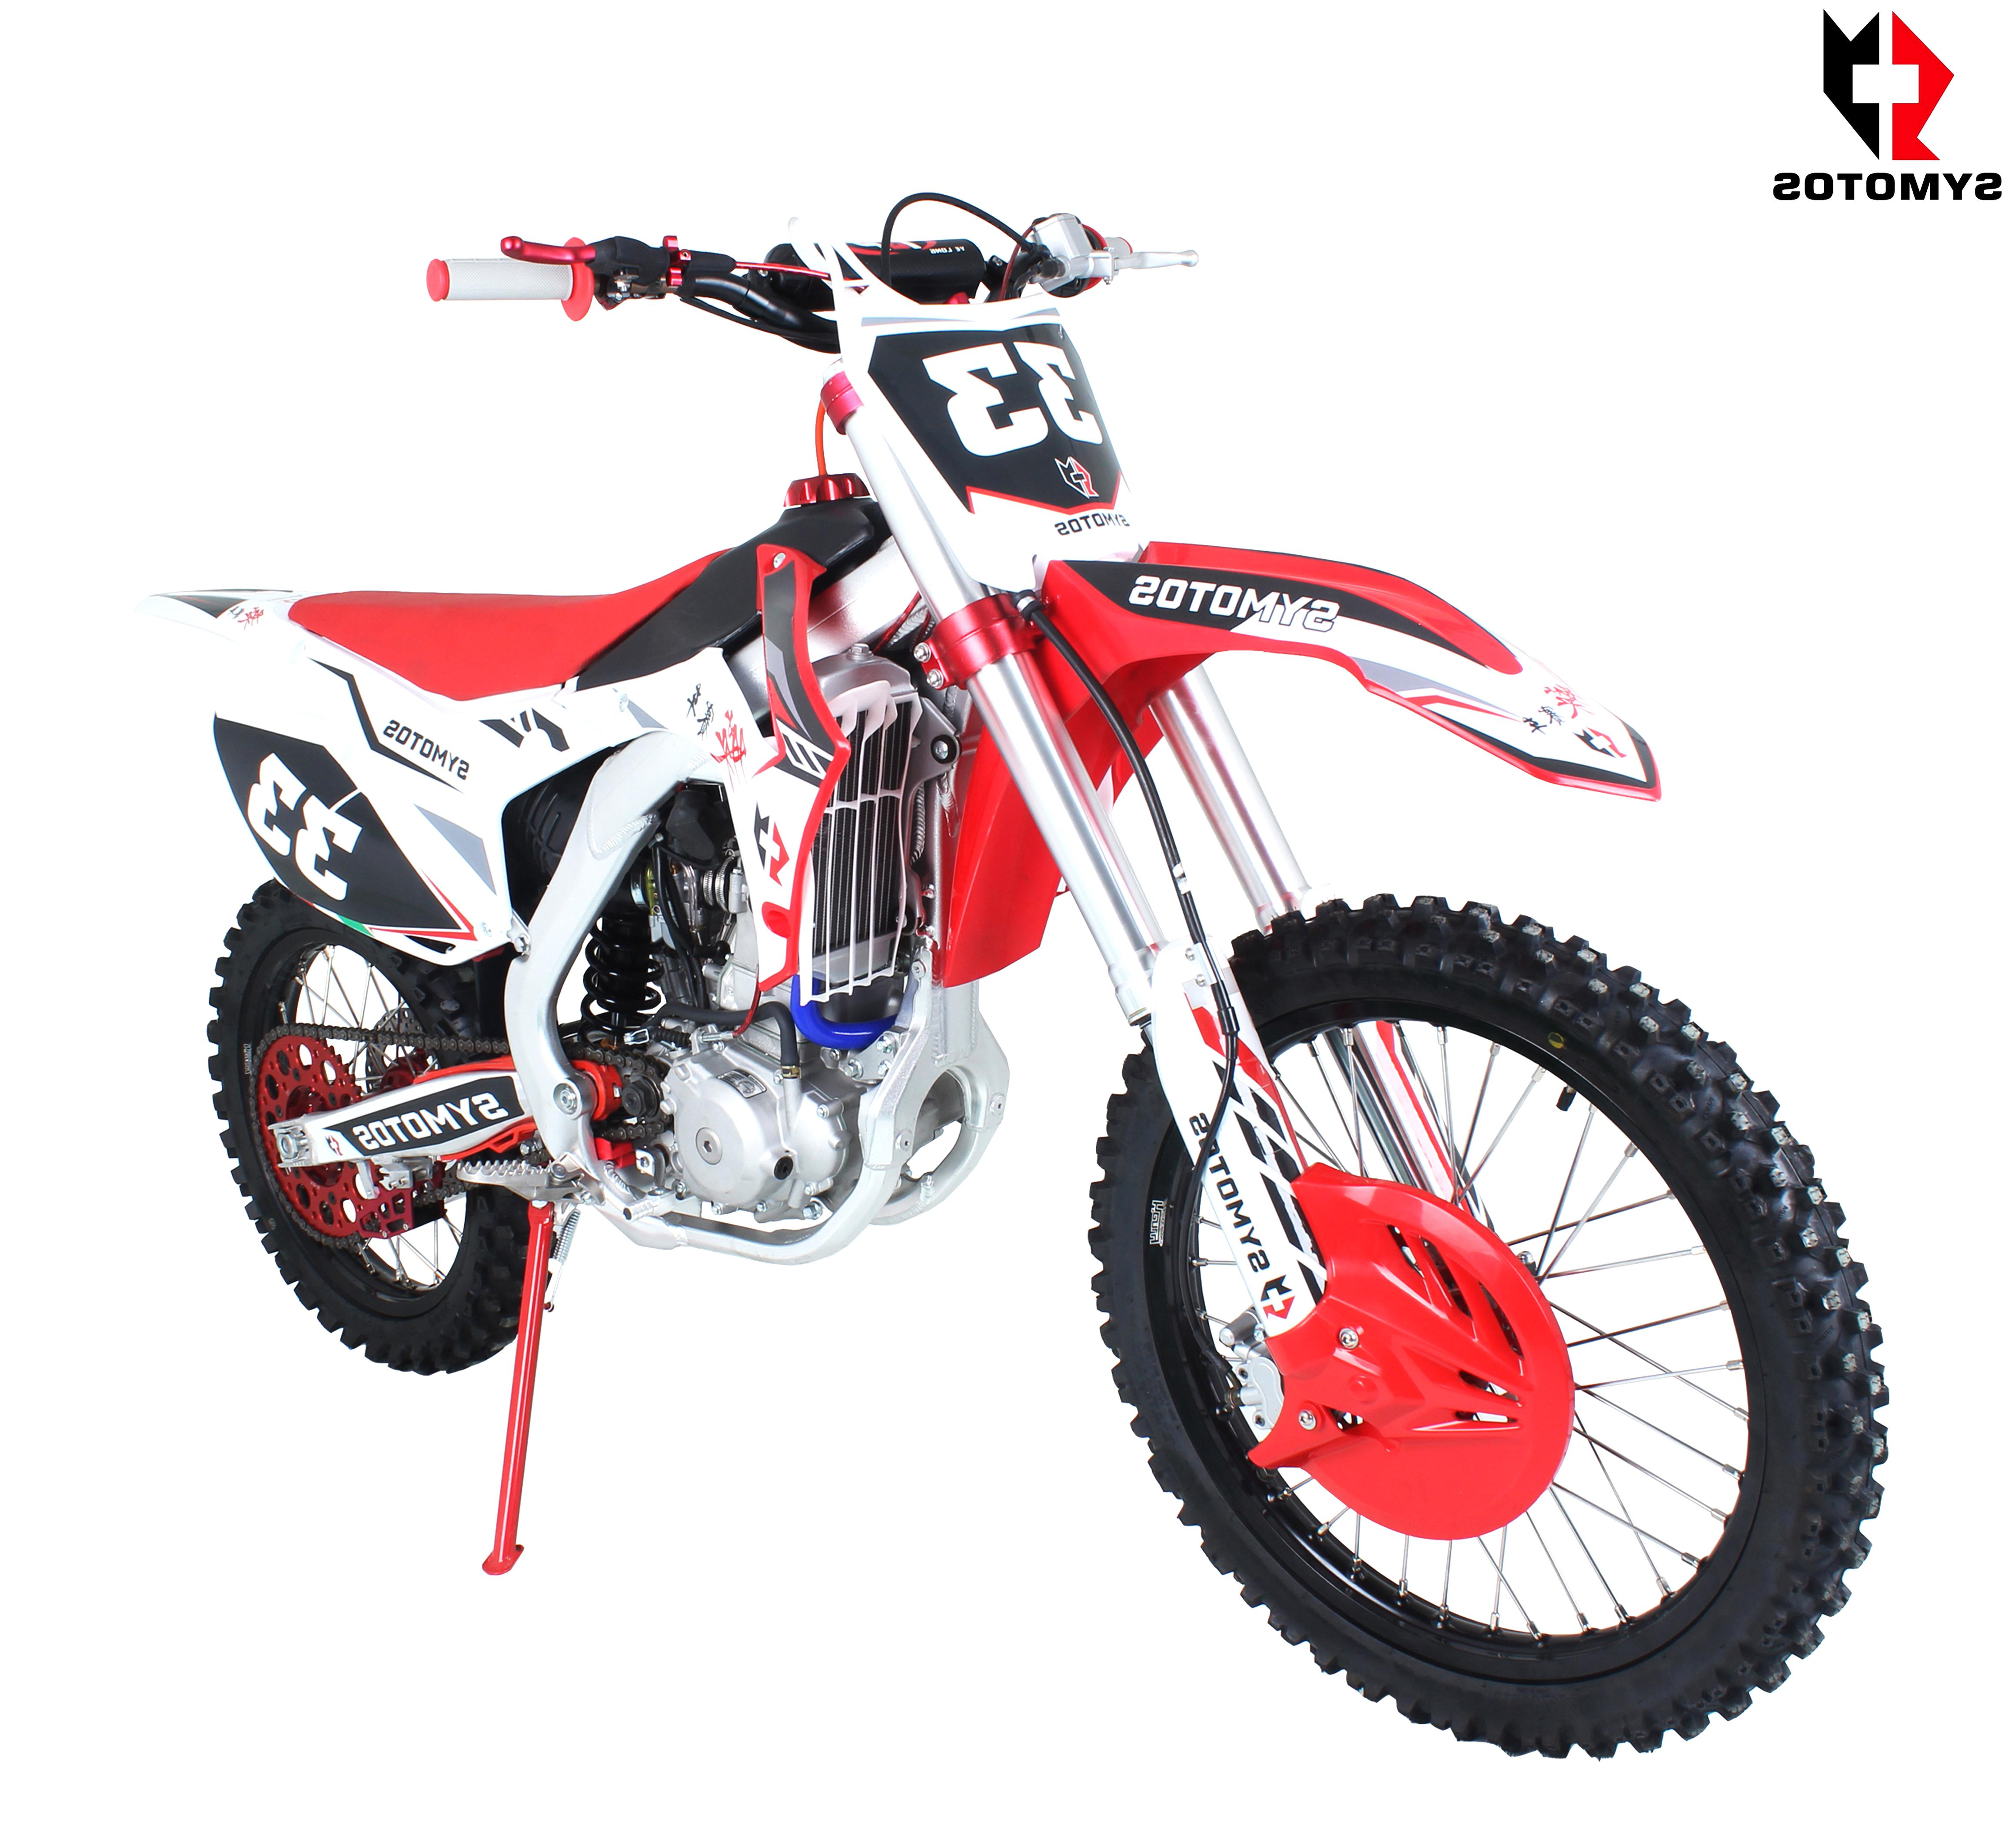 Moto cross occasion pas cher 250cc